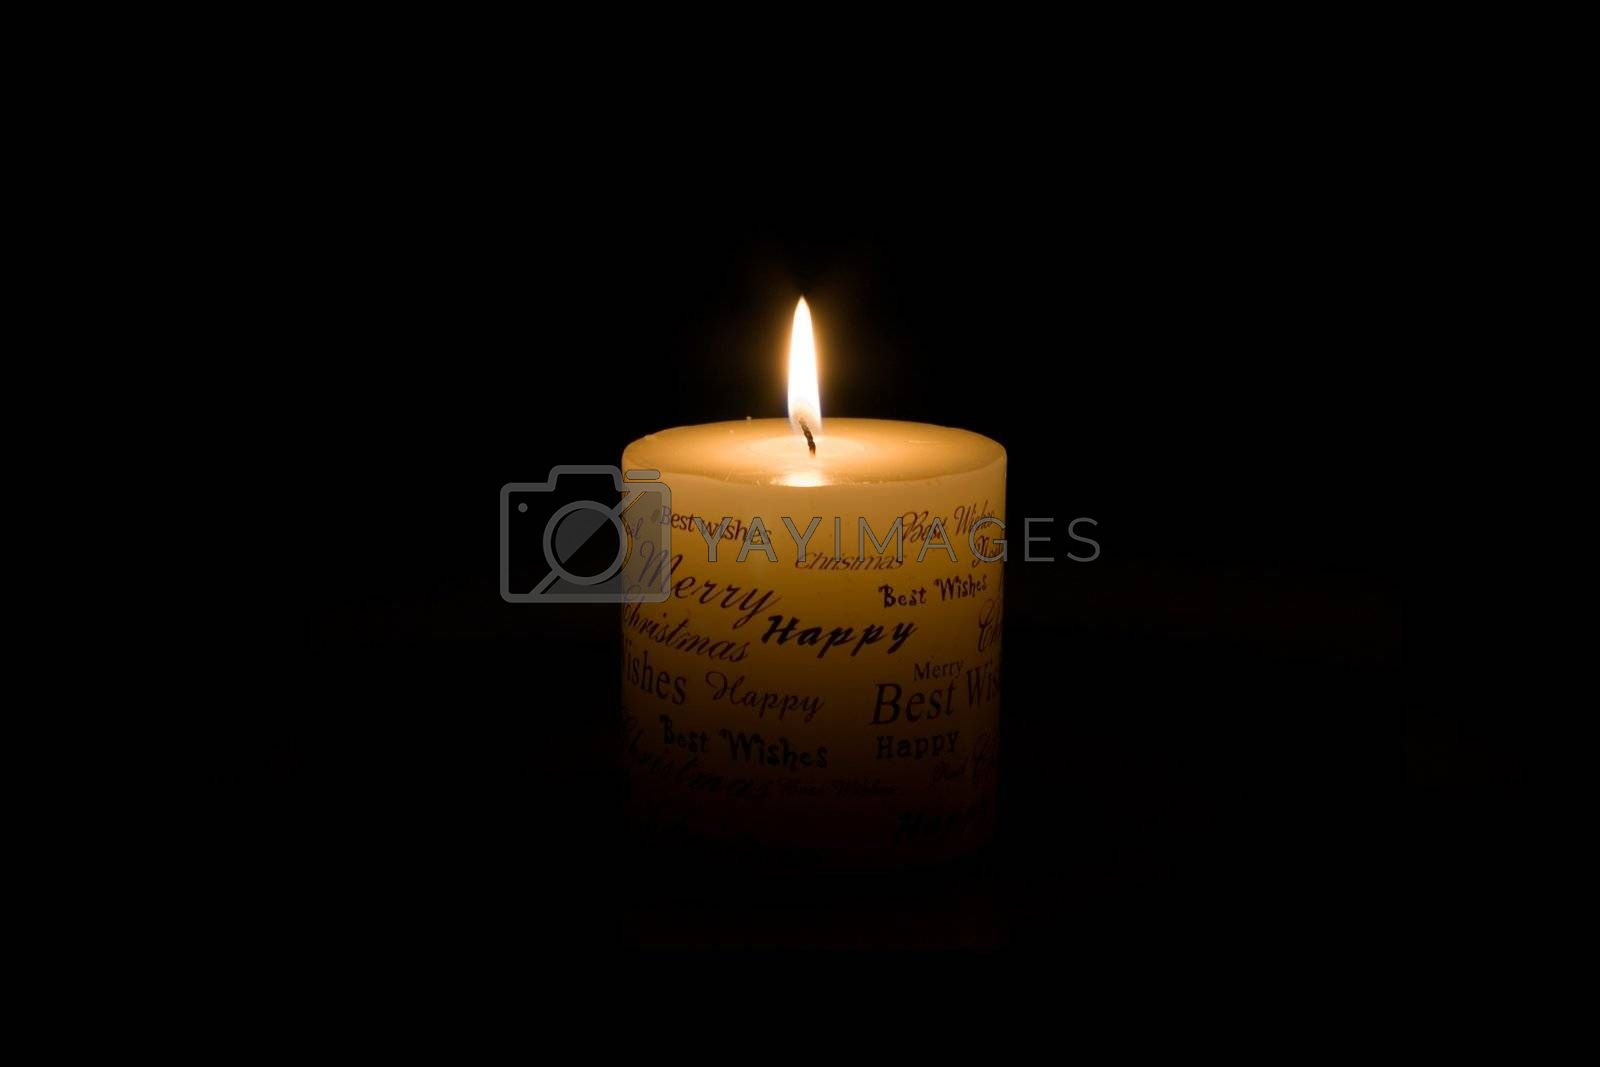 White Christmas candle lit on black background